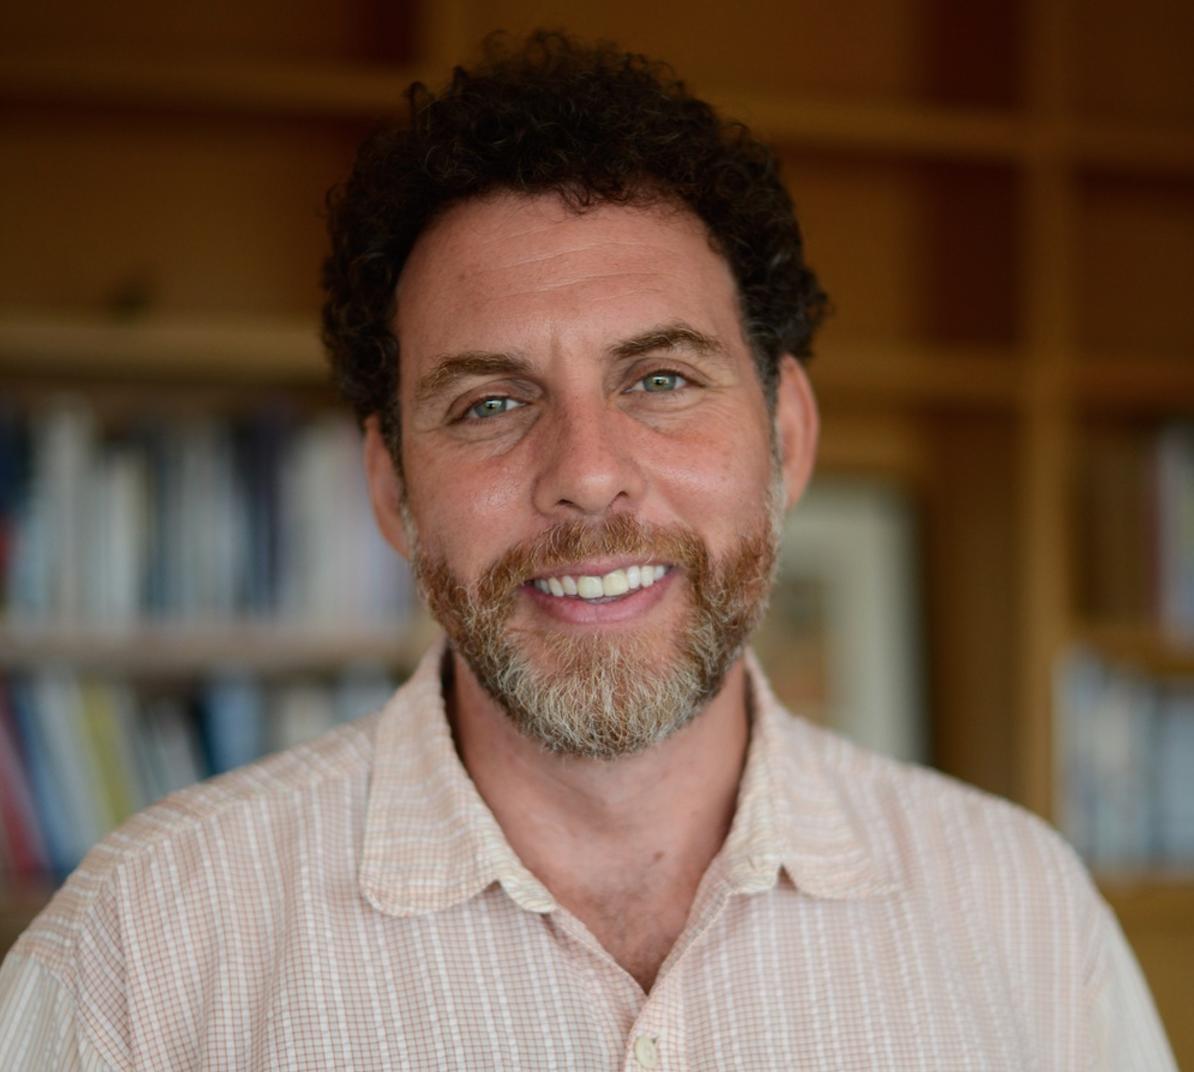 Fifteen Professors to Meet: Joshua Greene - Published in The Harvard Crimson.